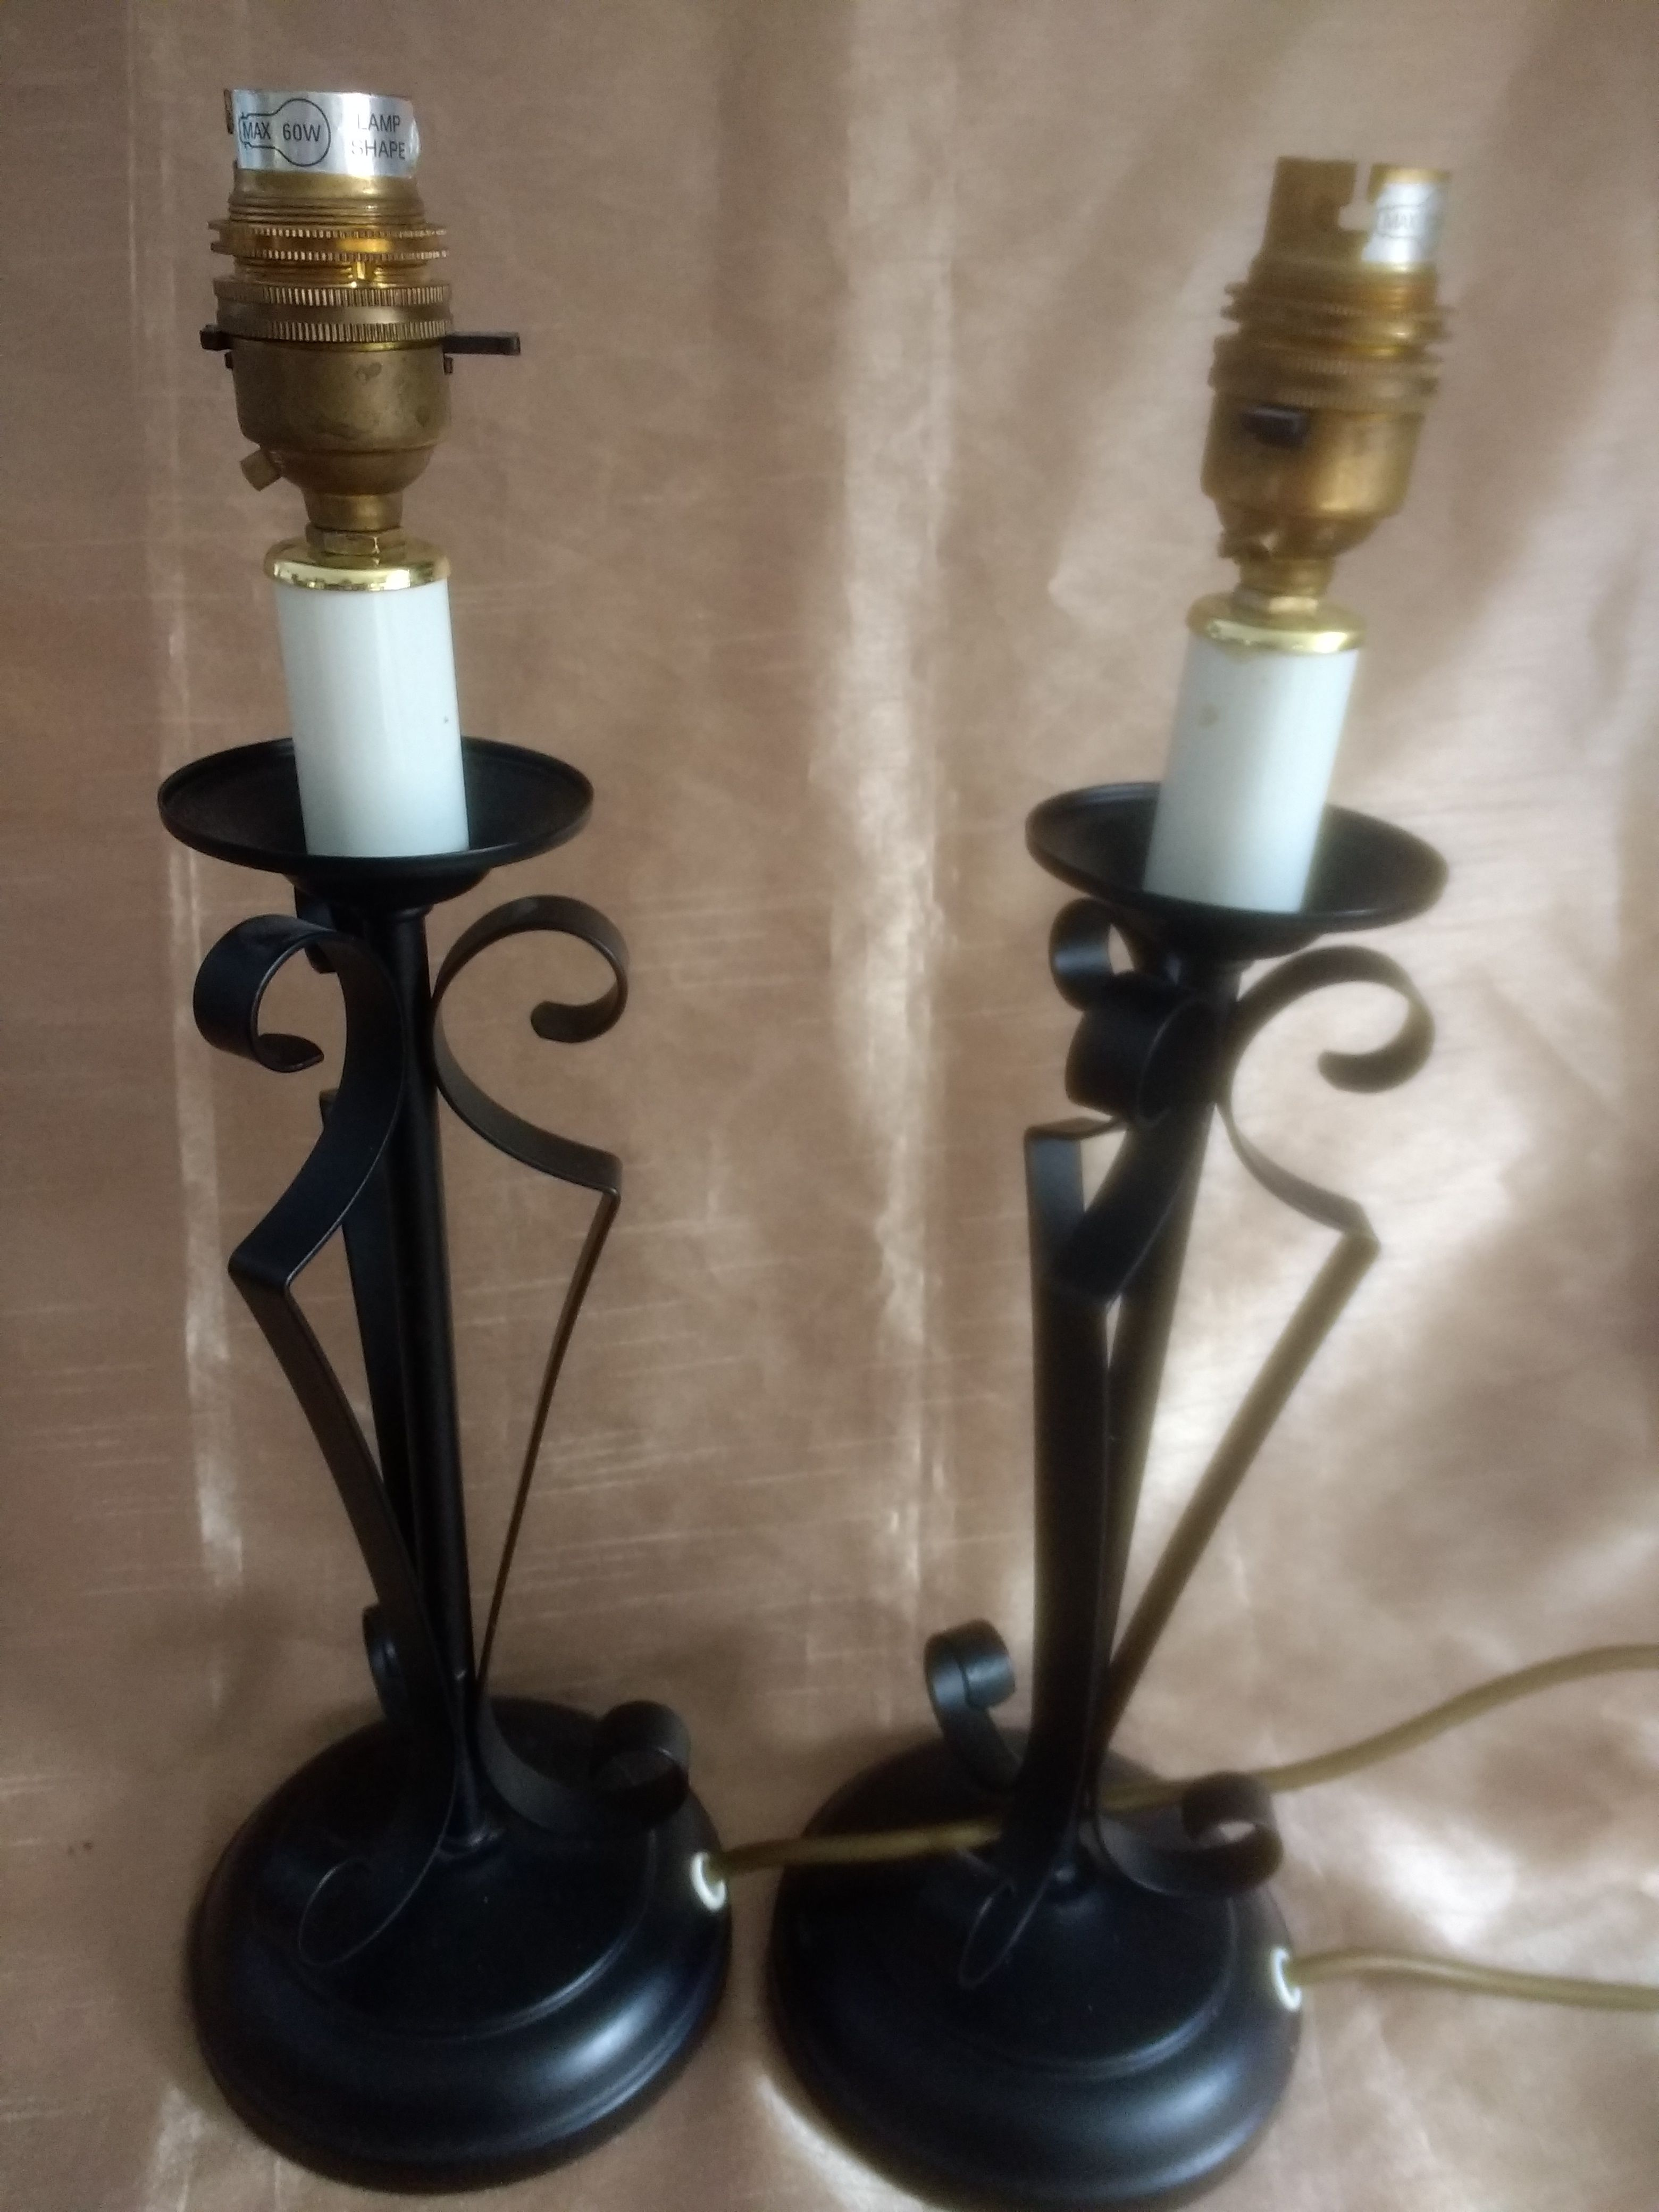 Classic Vintage 1920s Style Tudor Black Wrought Iron Table Lamp